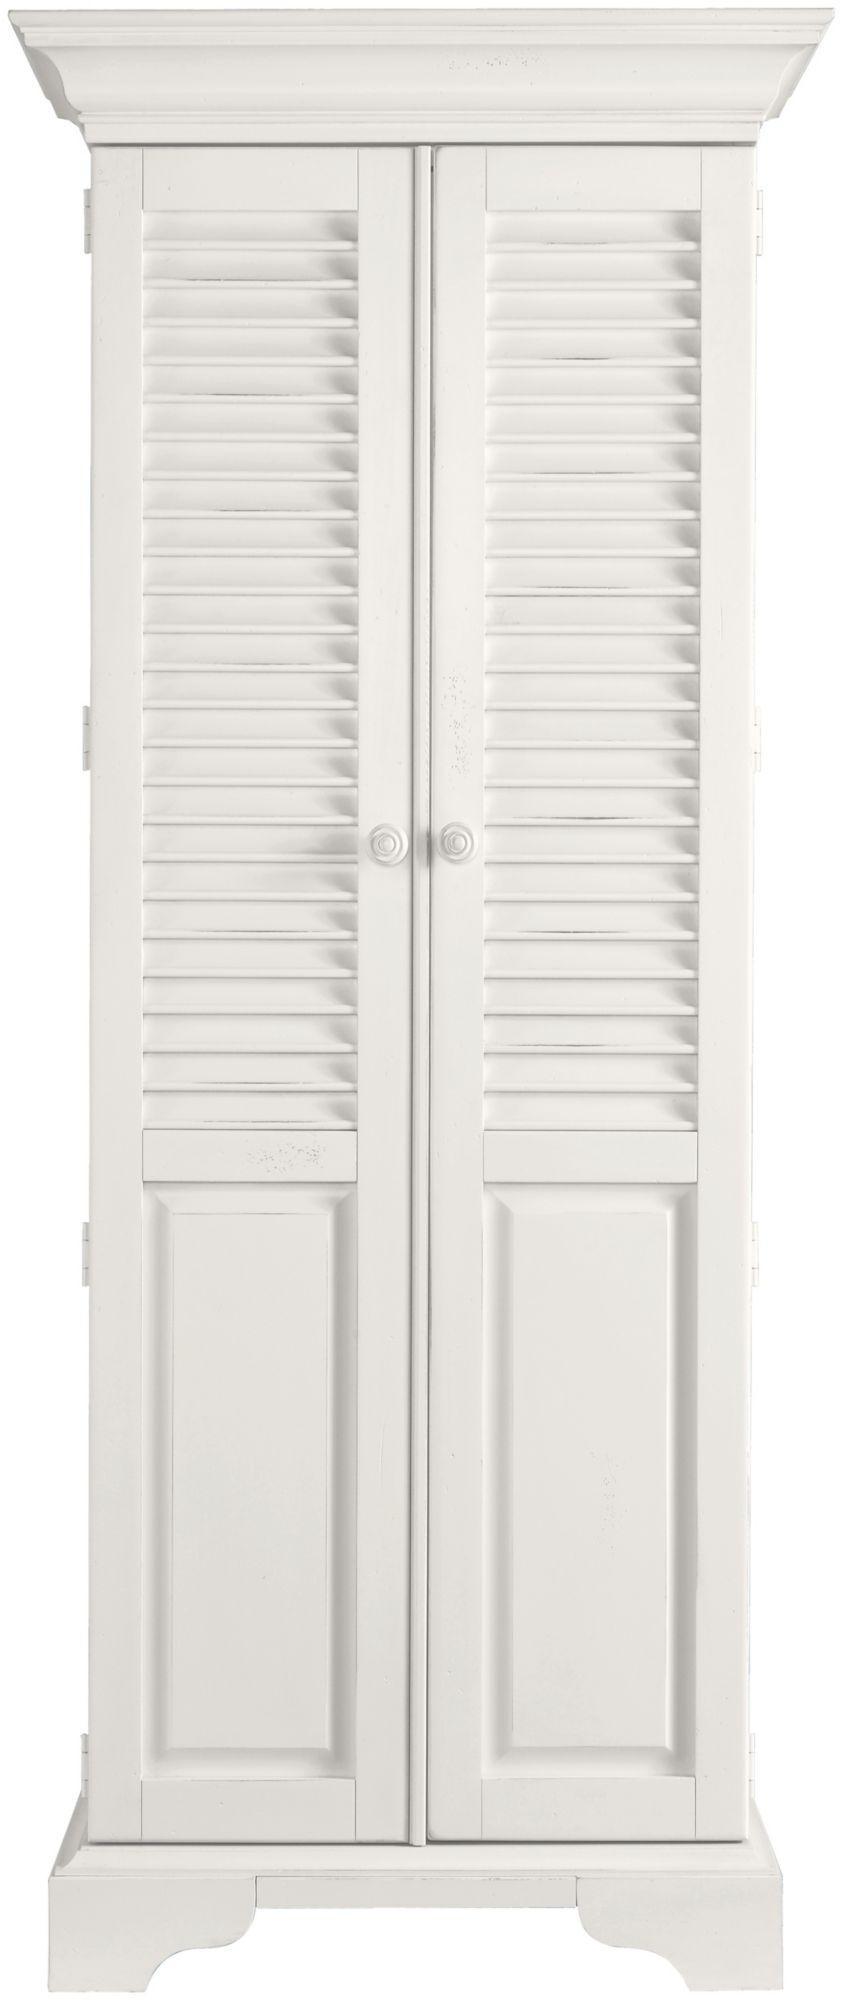 Stanley Furniture Coastal Living Retreat Summerhouse Utility Cabinet - Item Number: 411-23-14